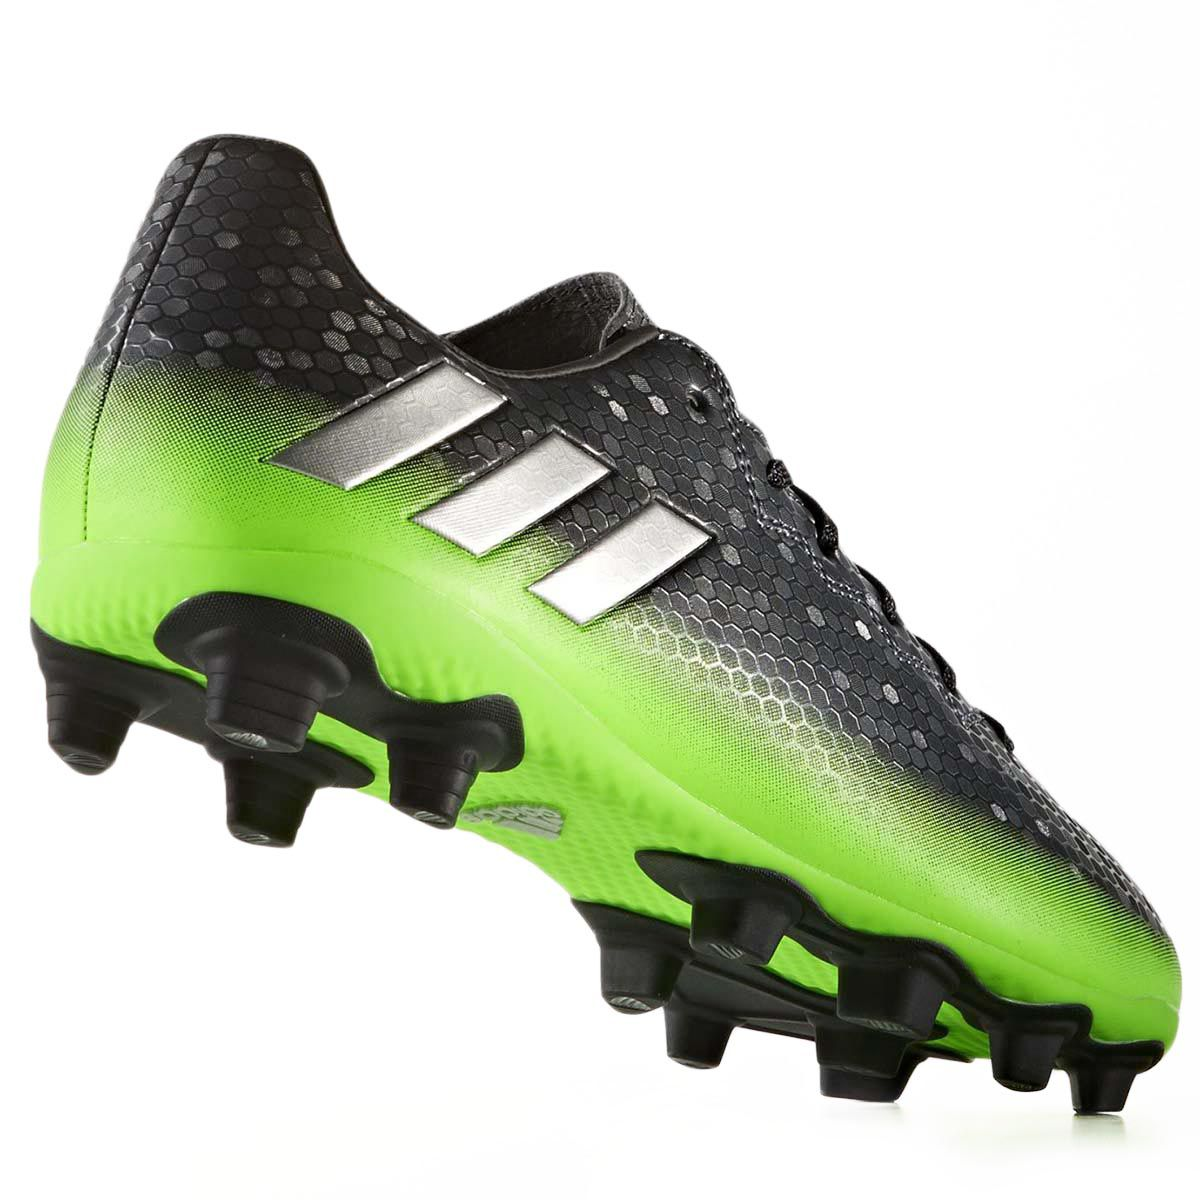 5416c1cf7e Chuteira Adidas Messi 16.4 FG Campo - Stigli